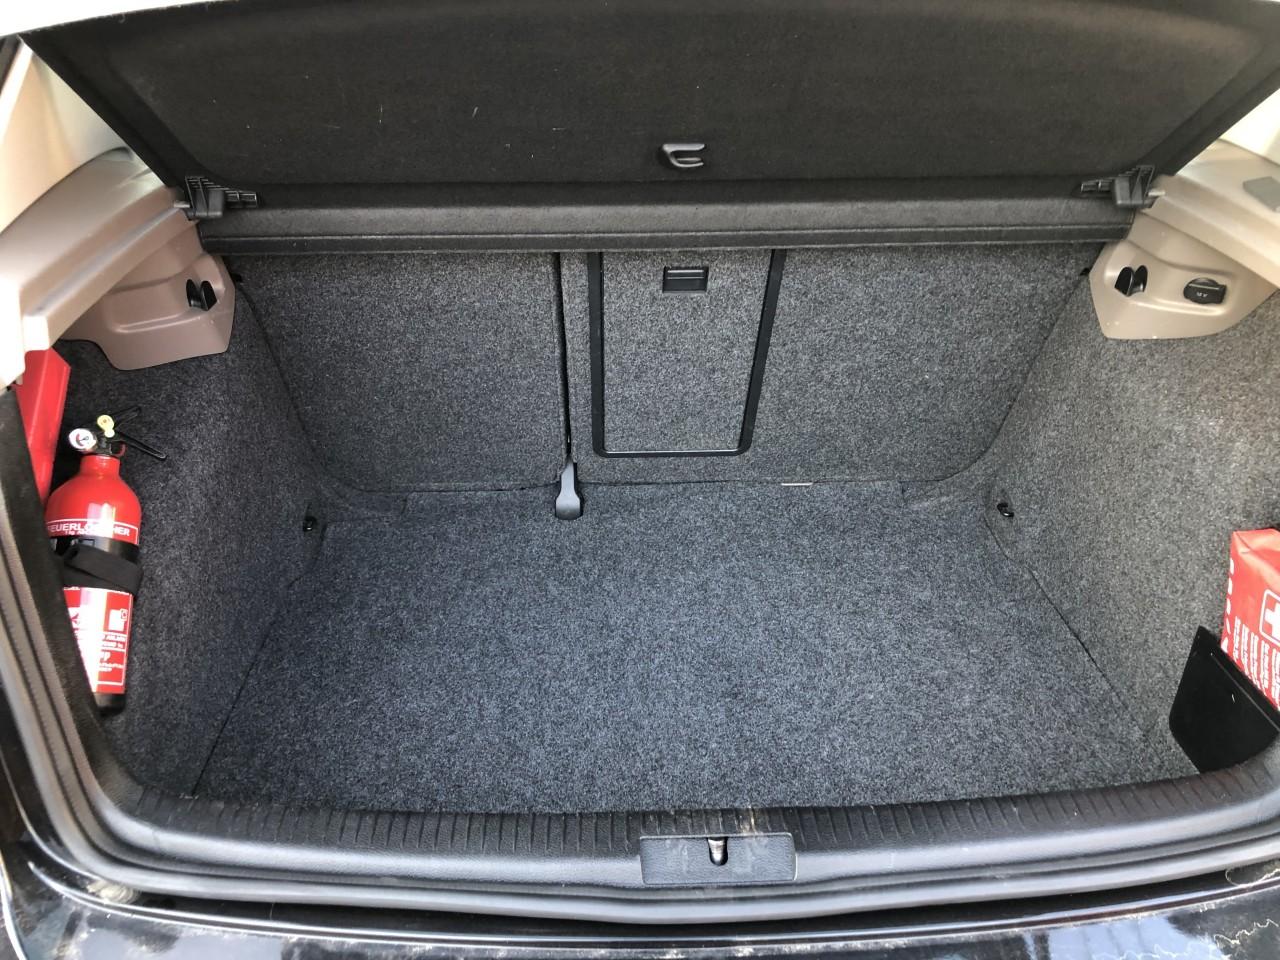 VW Golf 1600 2010